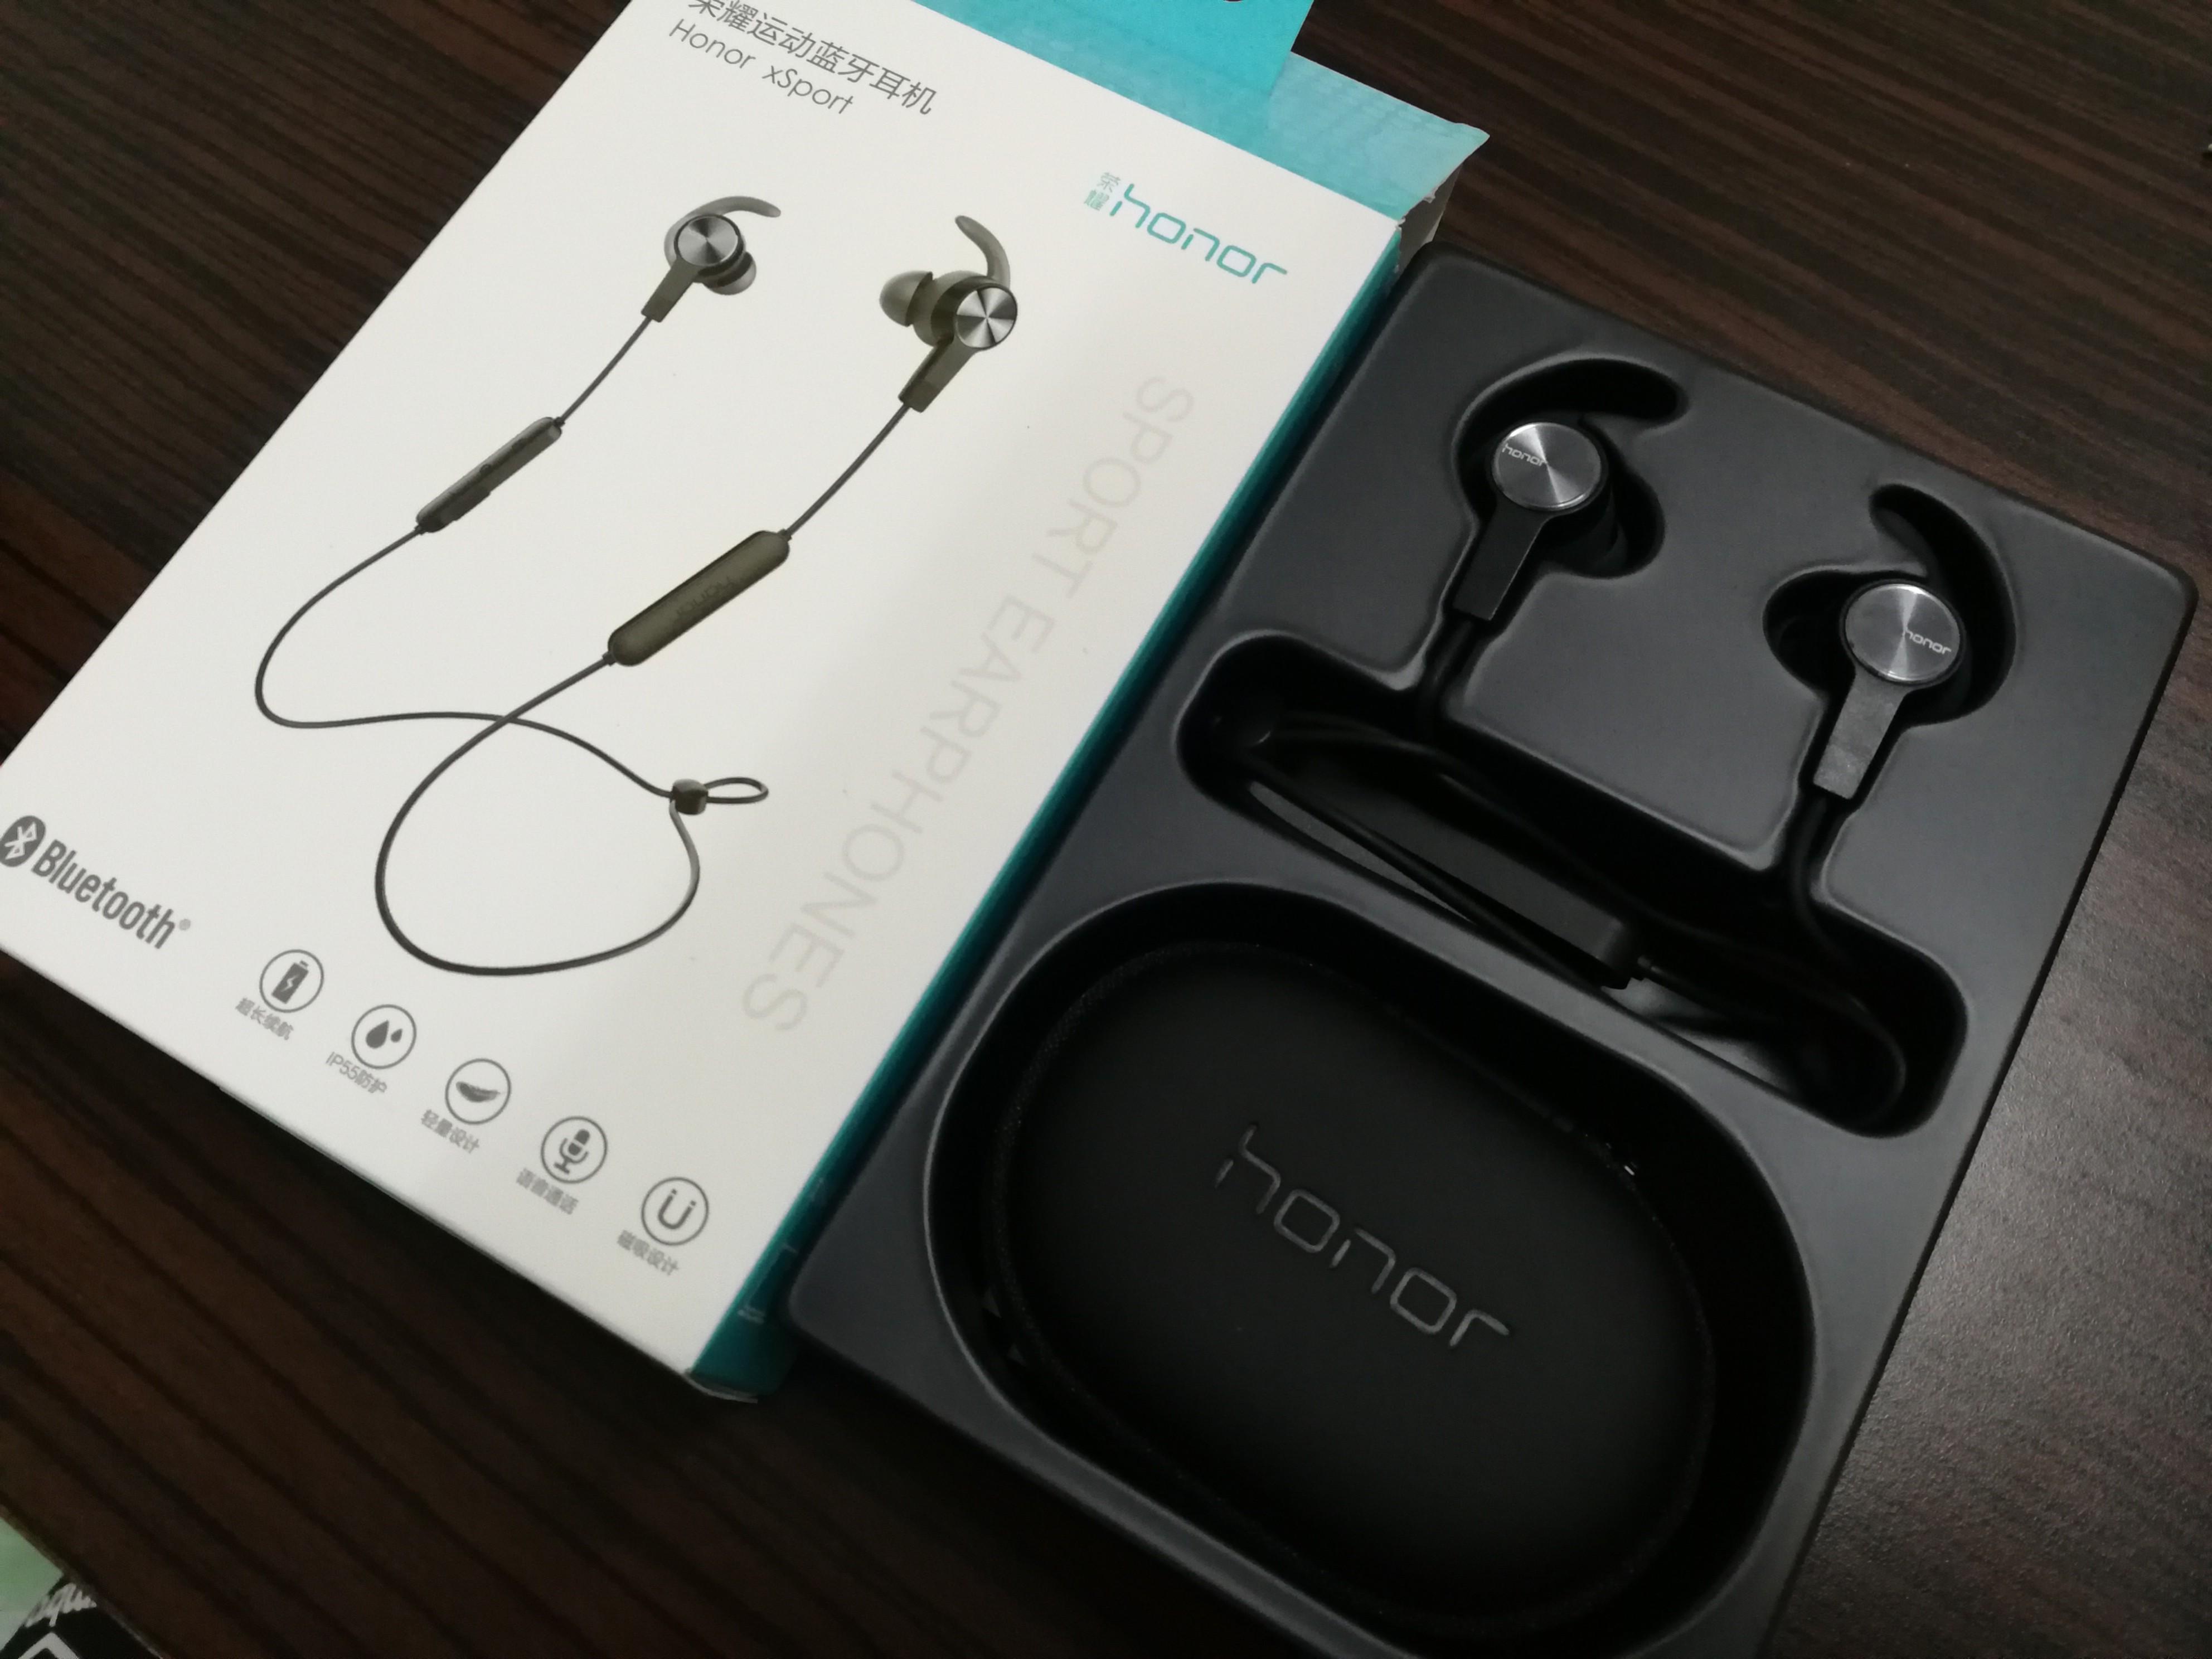 7a4d041e869 Huawei Honor AM61 xSport Wireless Bluetooth headset, Electronics, Audio on  Carousell